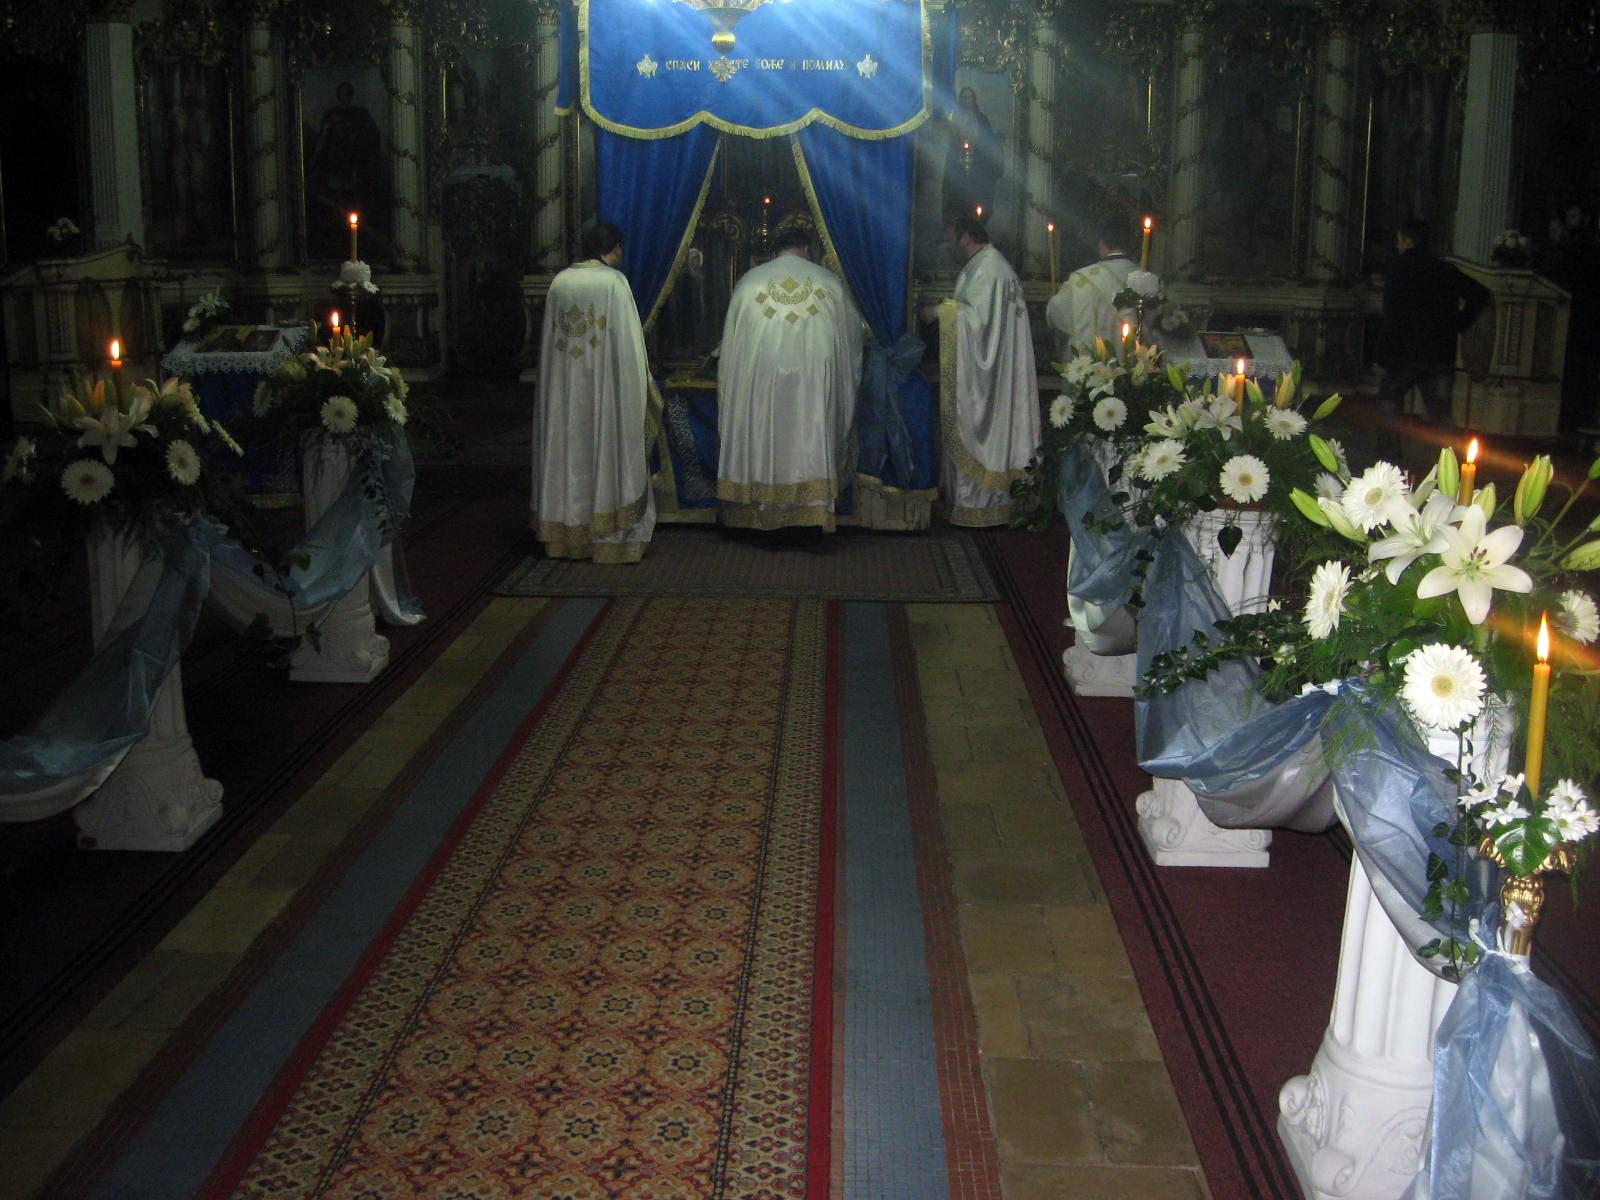 Sa Vaskršnjeg bogosluženja u bečejskoj crkvi | Foto: Vlastimir Jankov